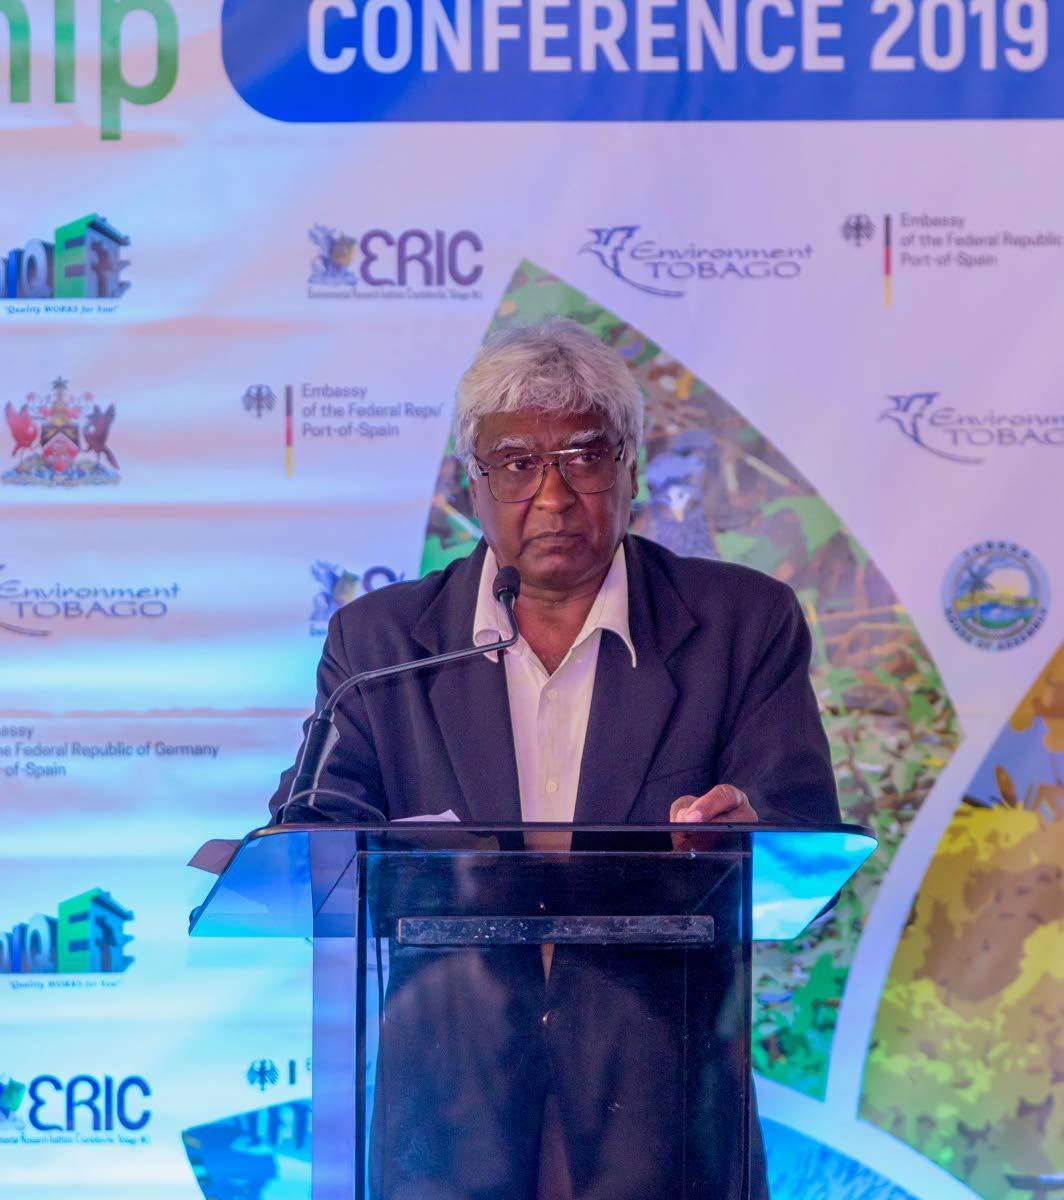 President of Environment Tobago Bertrand Bhikarry speaks at the inaugural Tobago Environment Partnership conference on Monday.